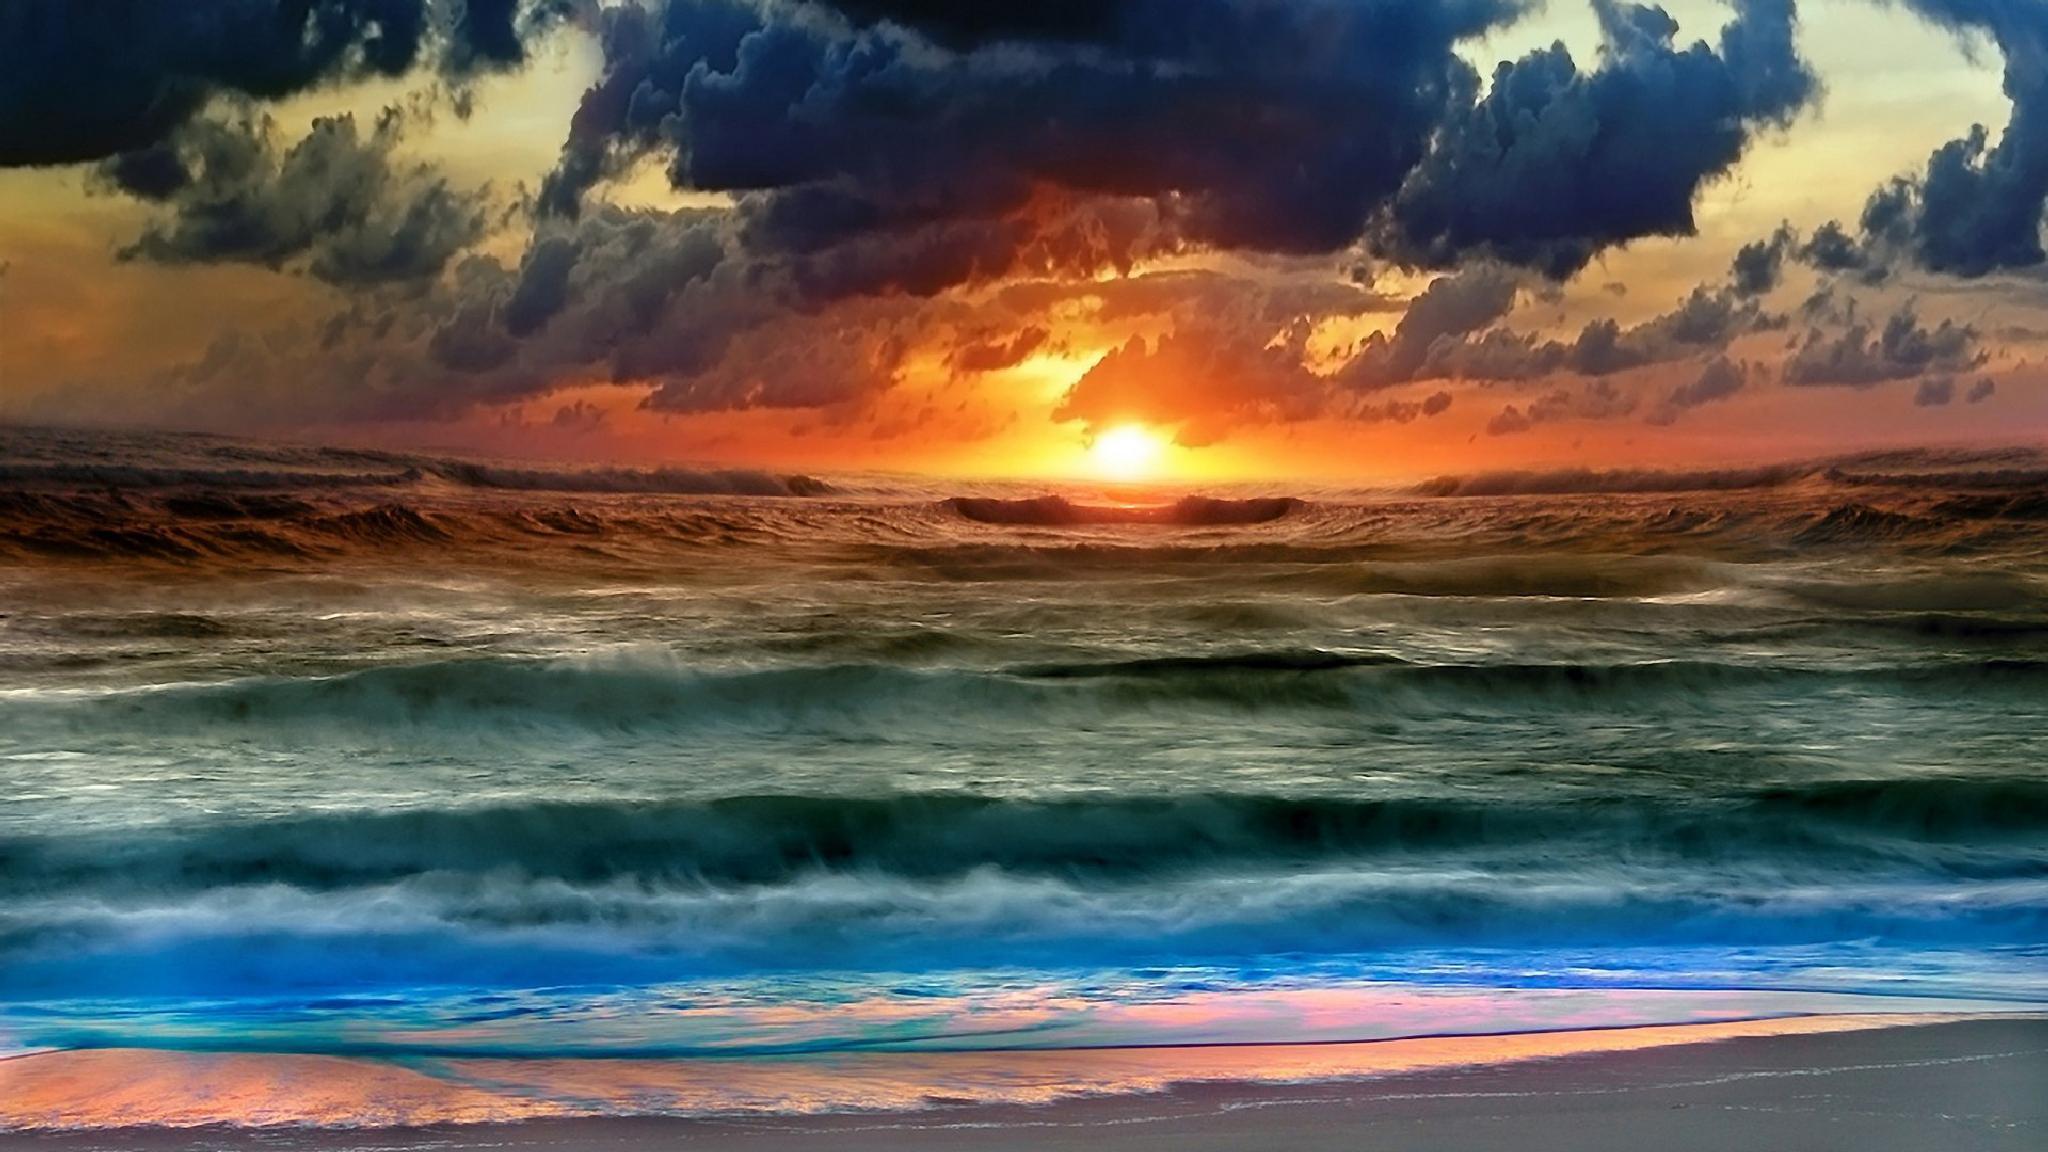 Sunrise by joewhite